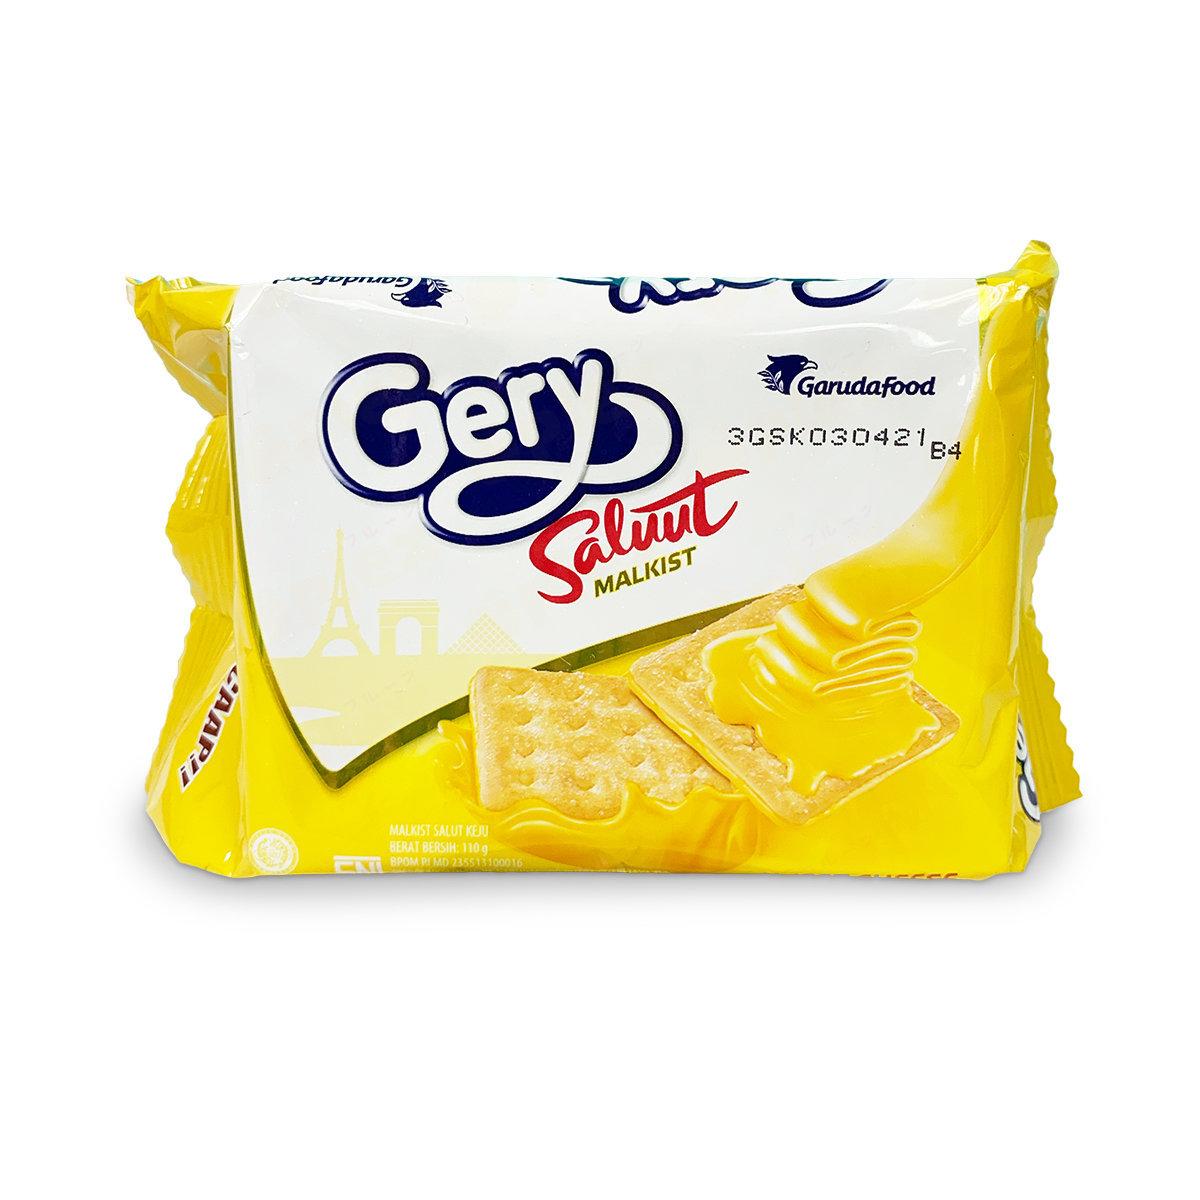 Gery Saluut 厚醬梳打餅 - 芝士味 (110克)